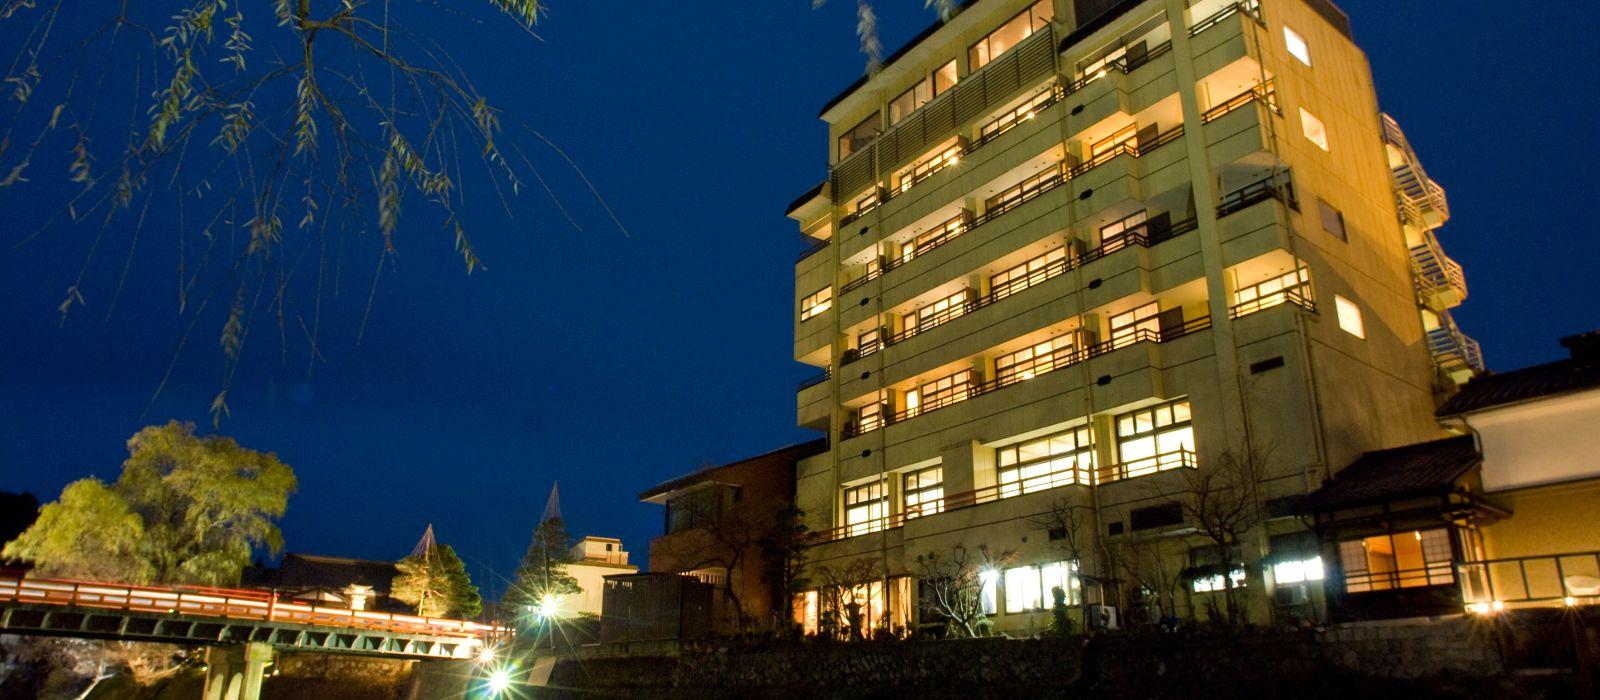 Hotel Honjin Hiranoya Bekkan Ryokan Japan